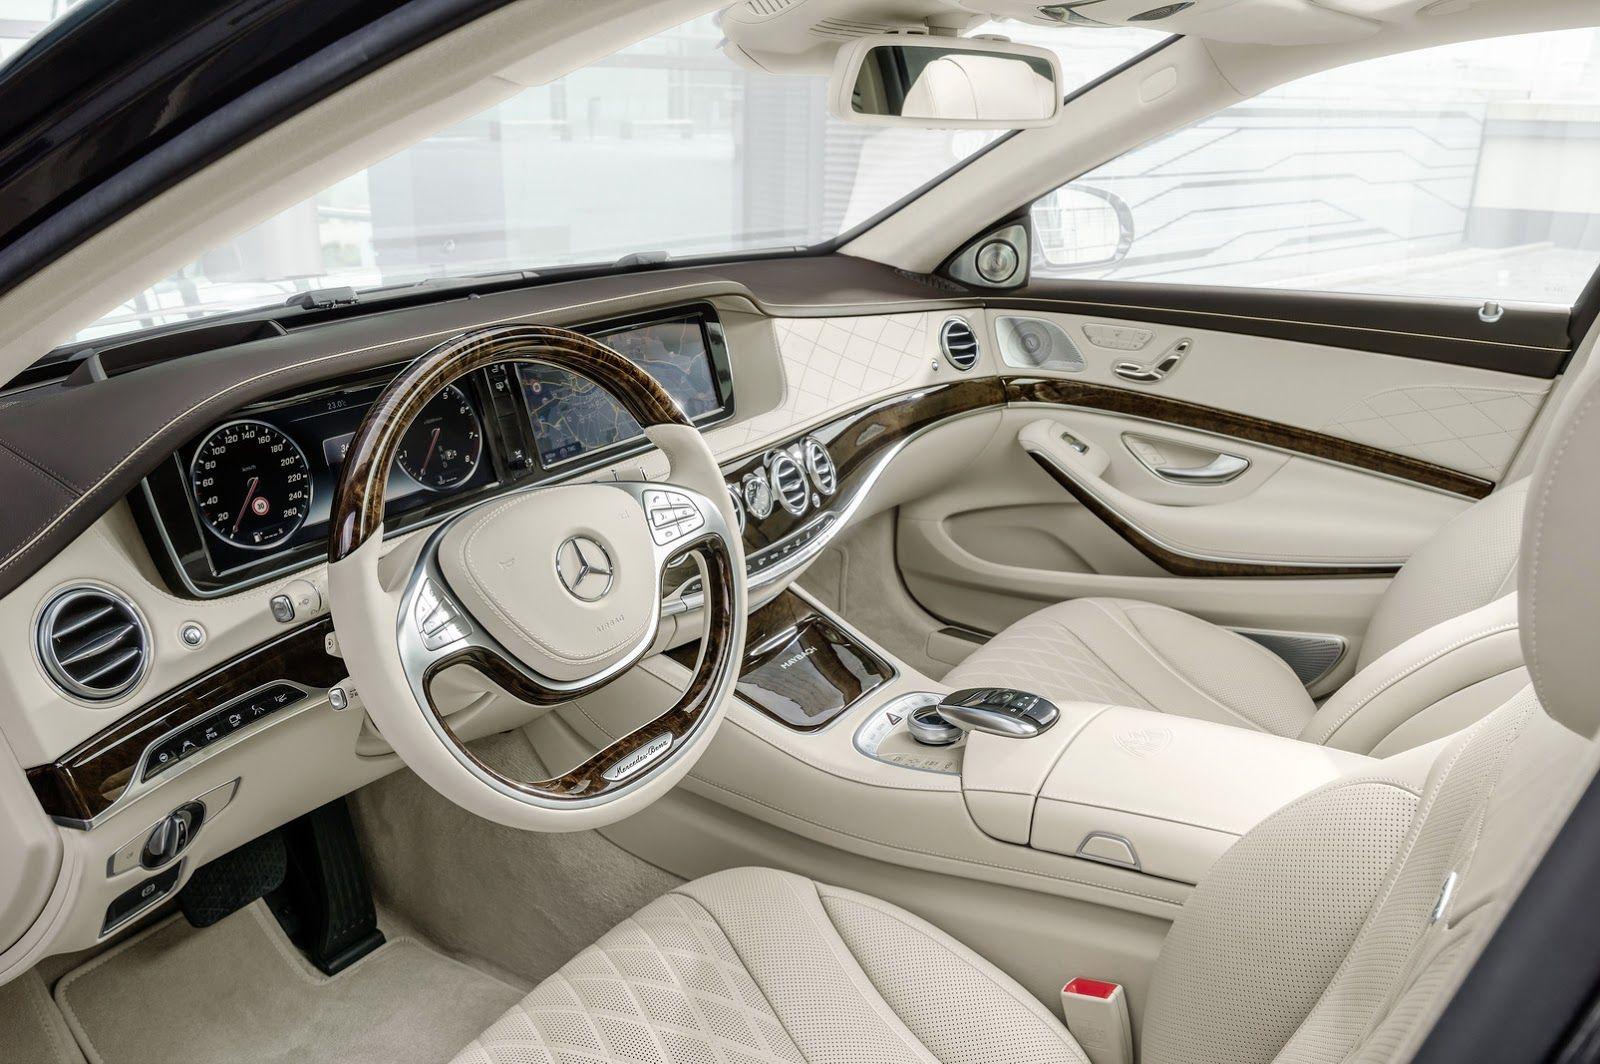 Presentation De La Mercedes Benz Maybach S600 Au Salon De L Auto A